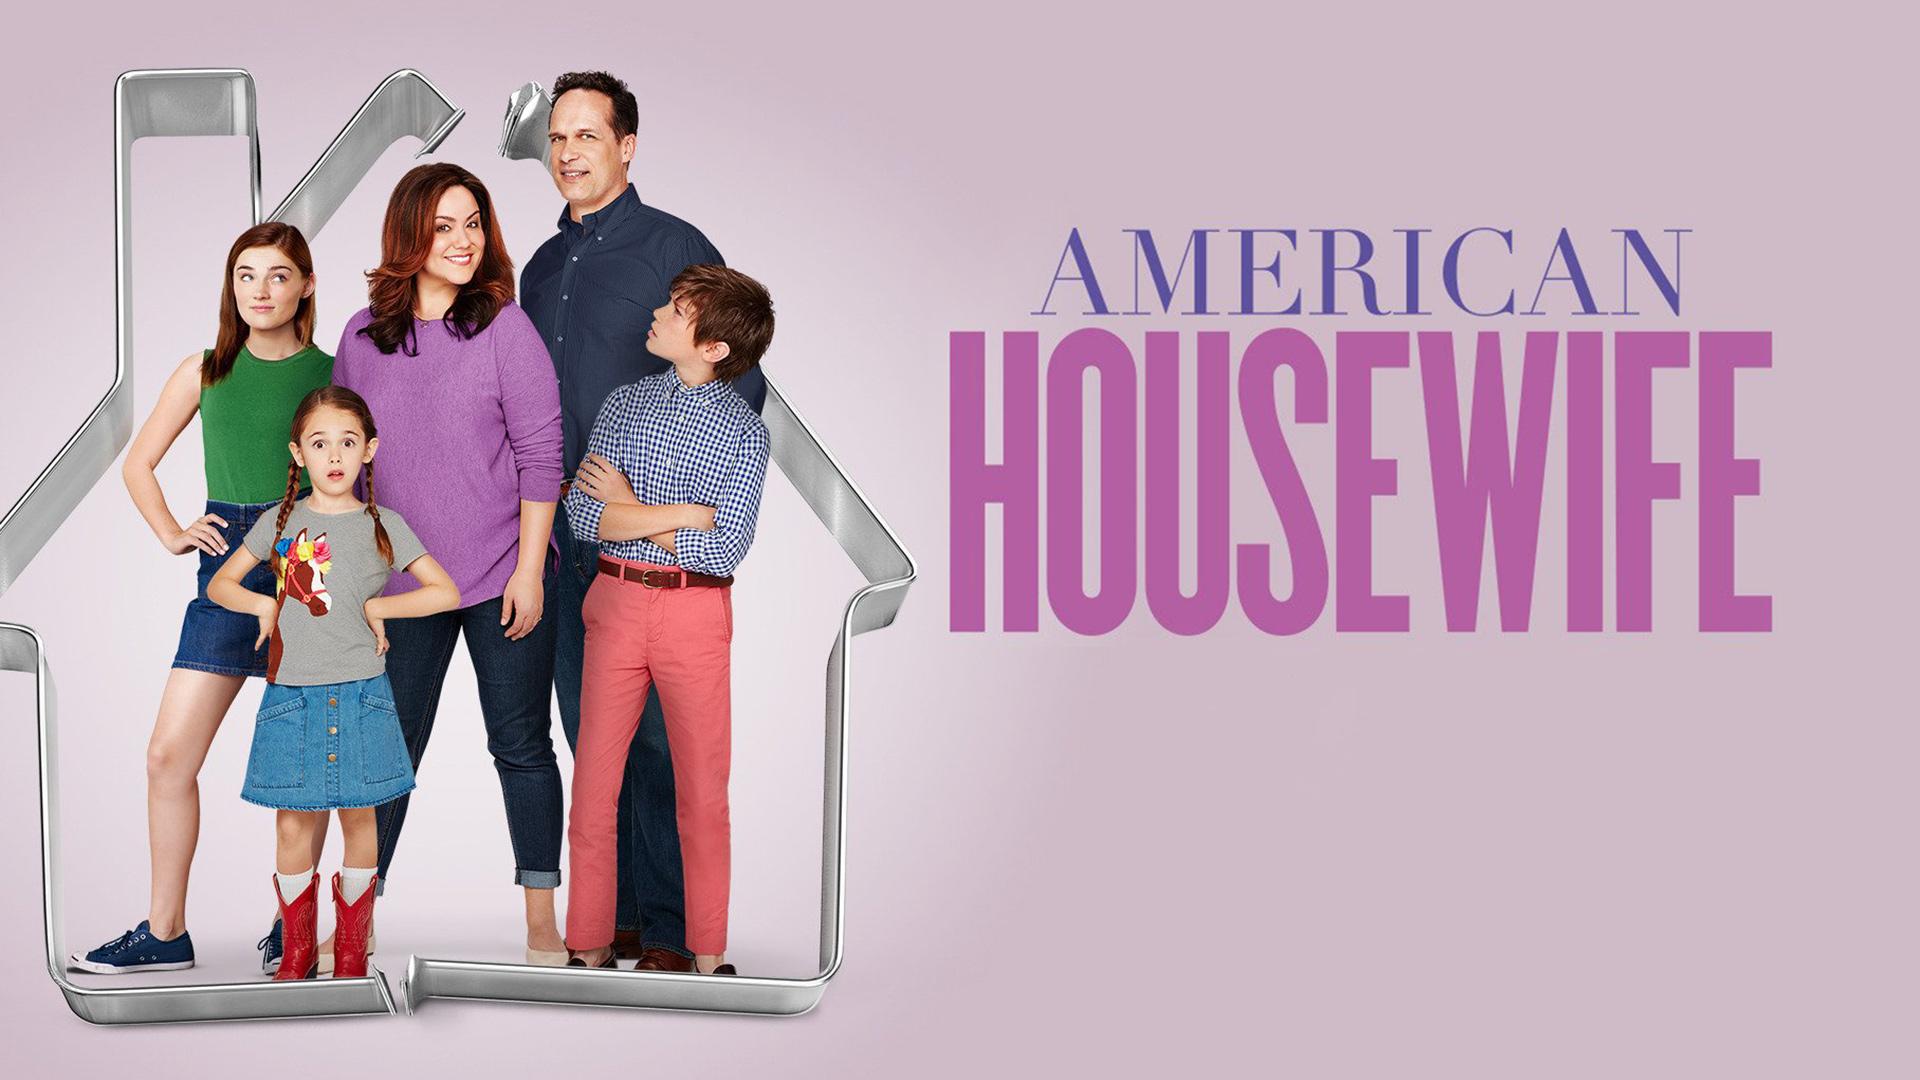 American Housewife Season 1